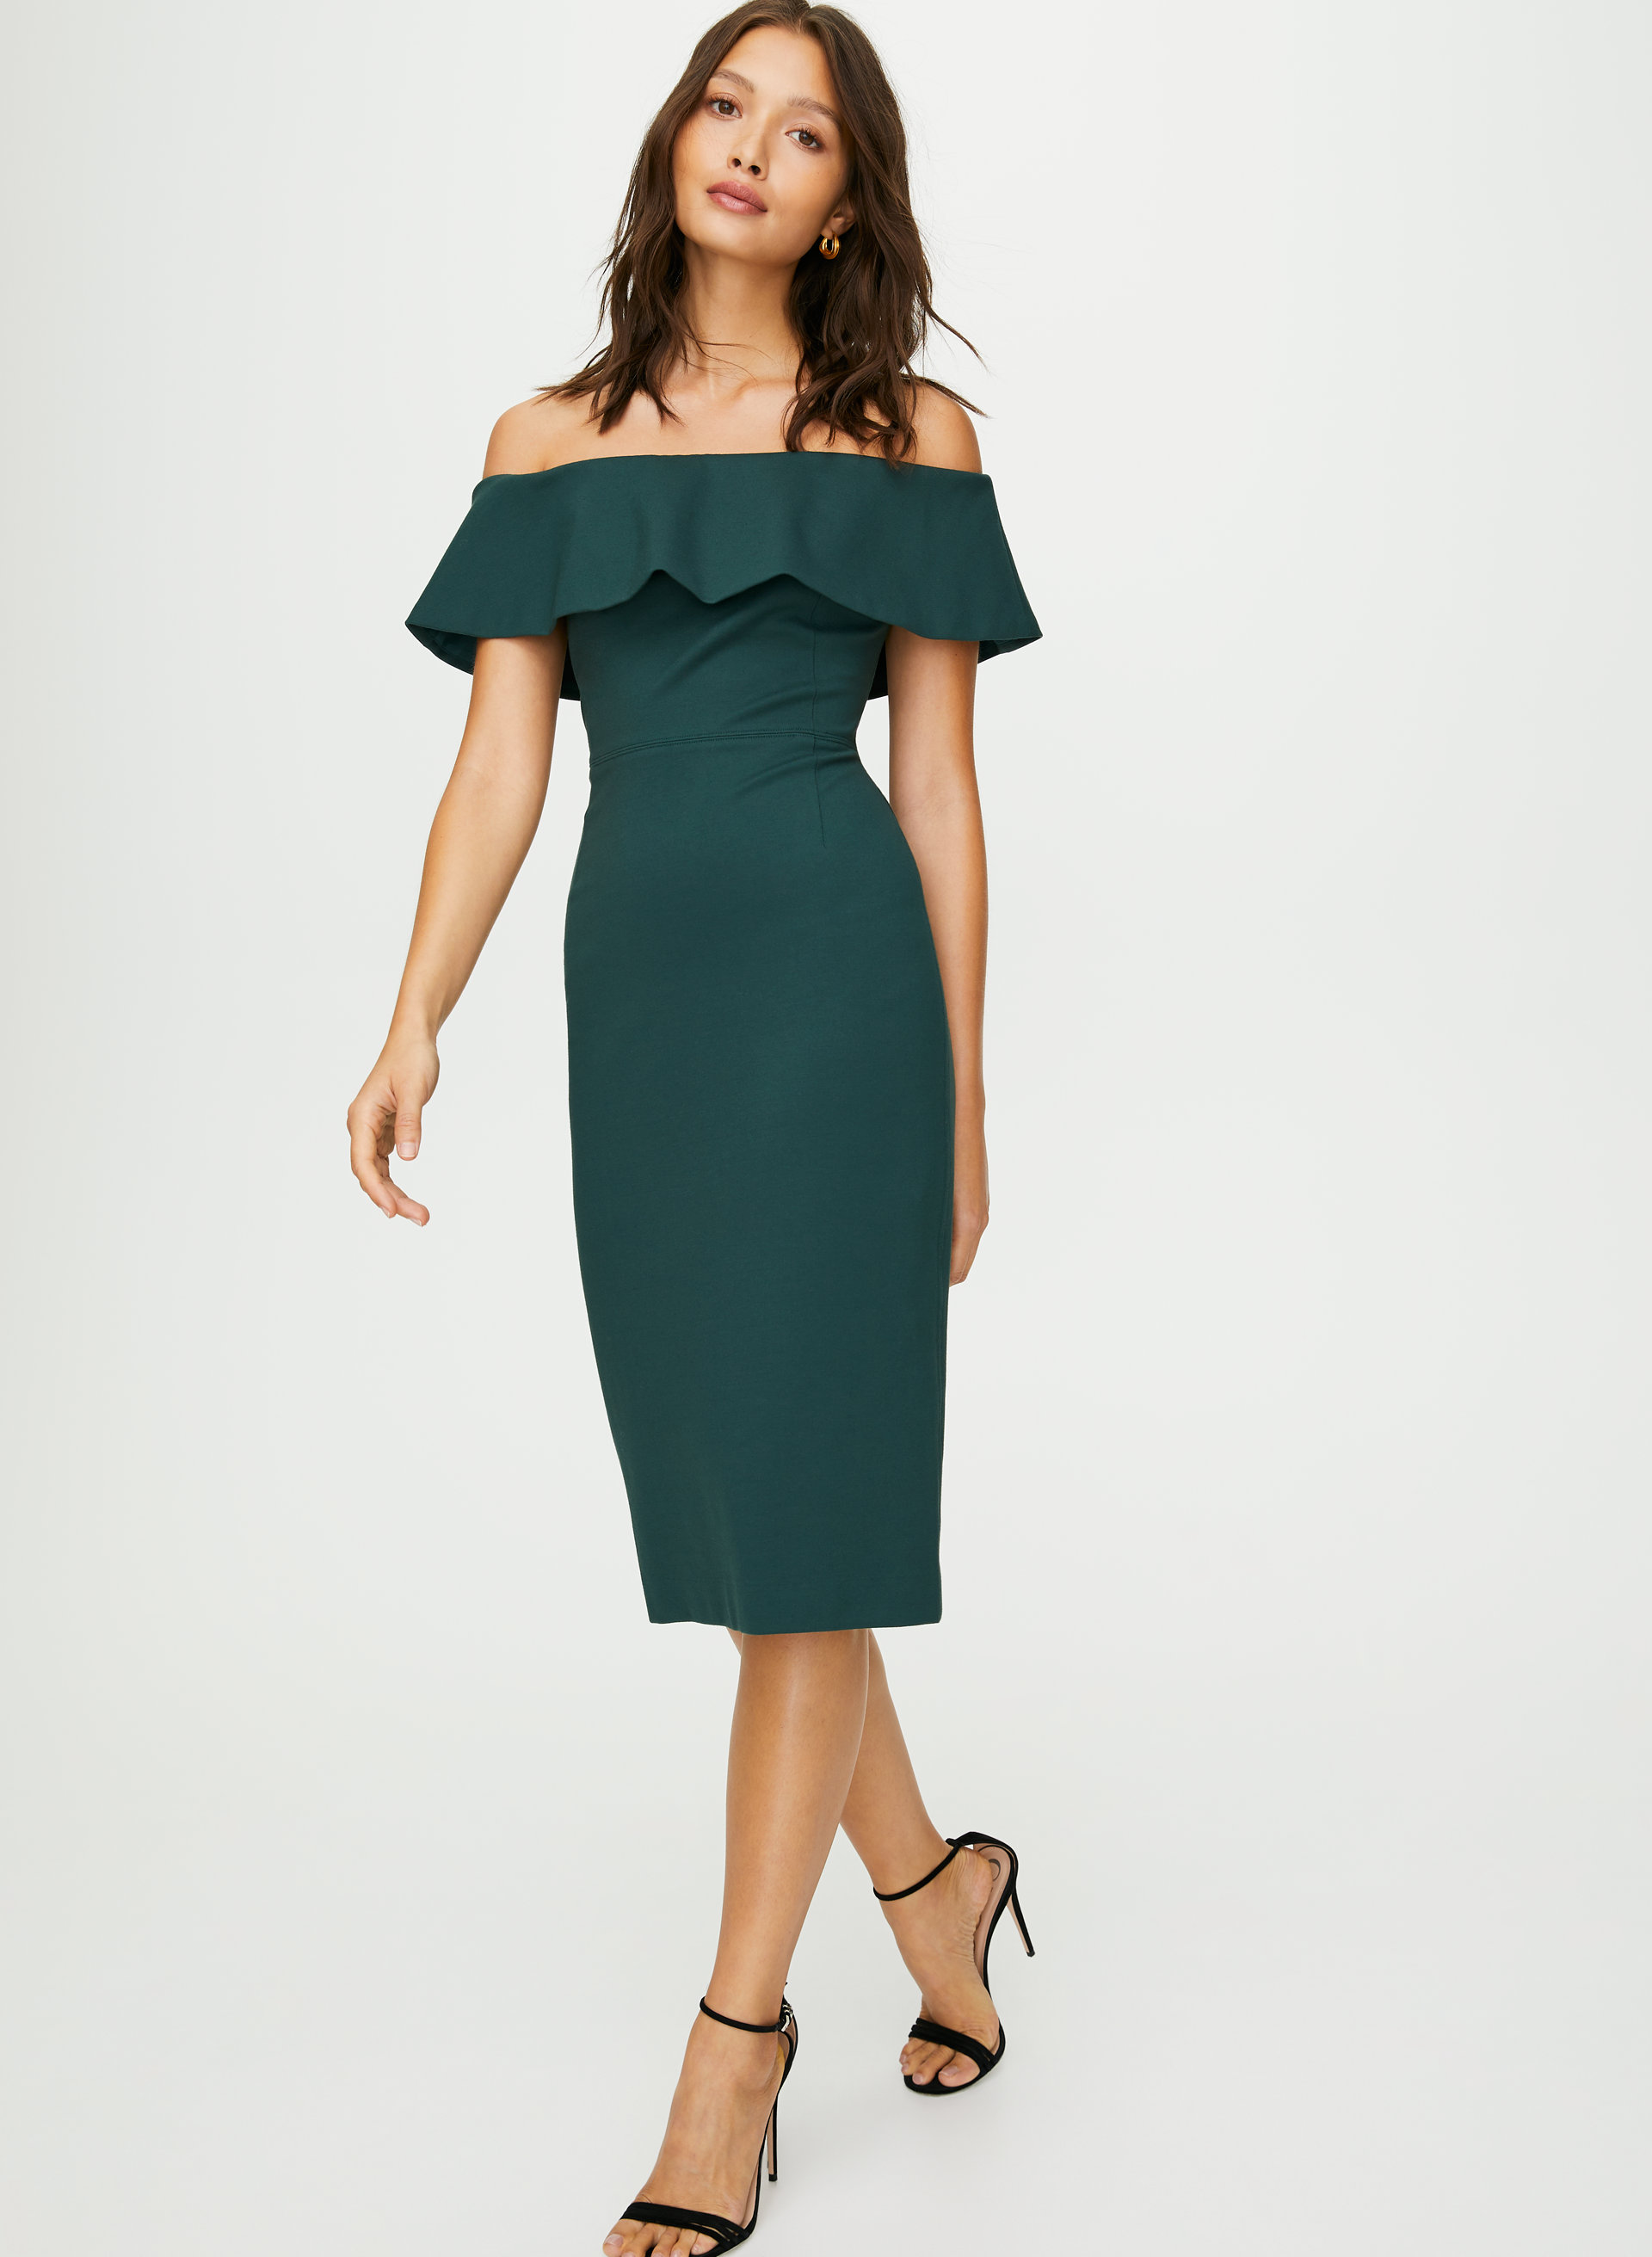 Latest premium Service Dress option for the United States